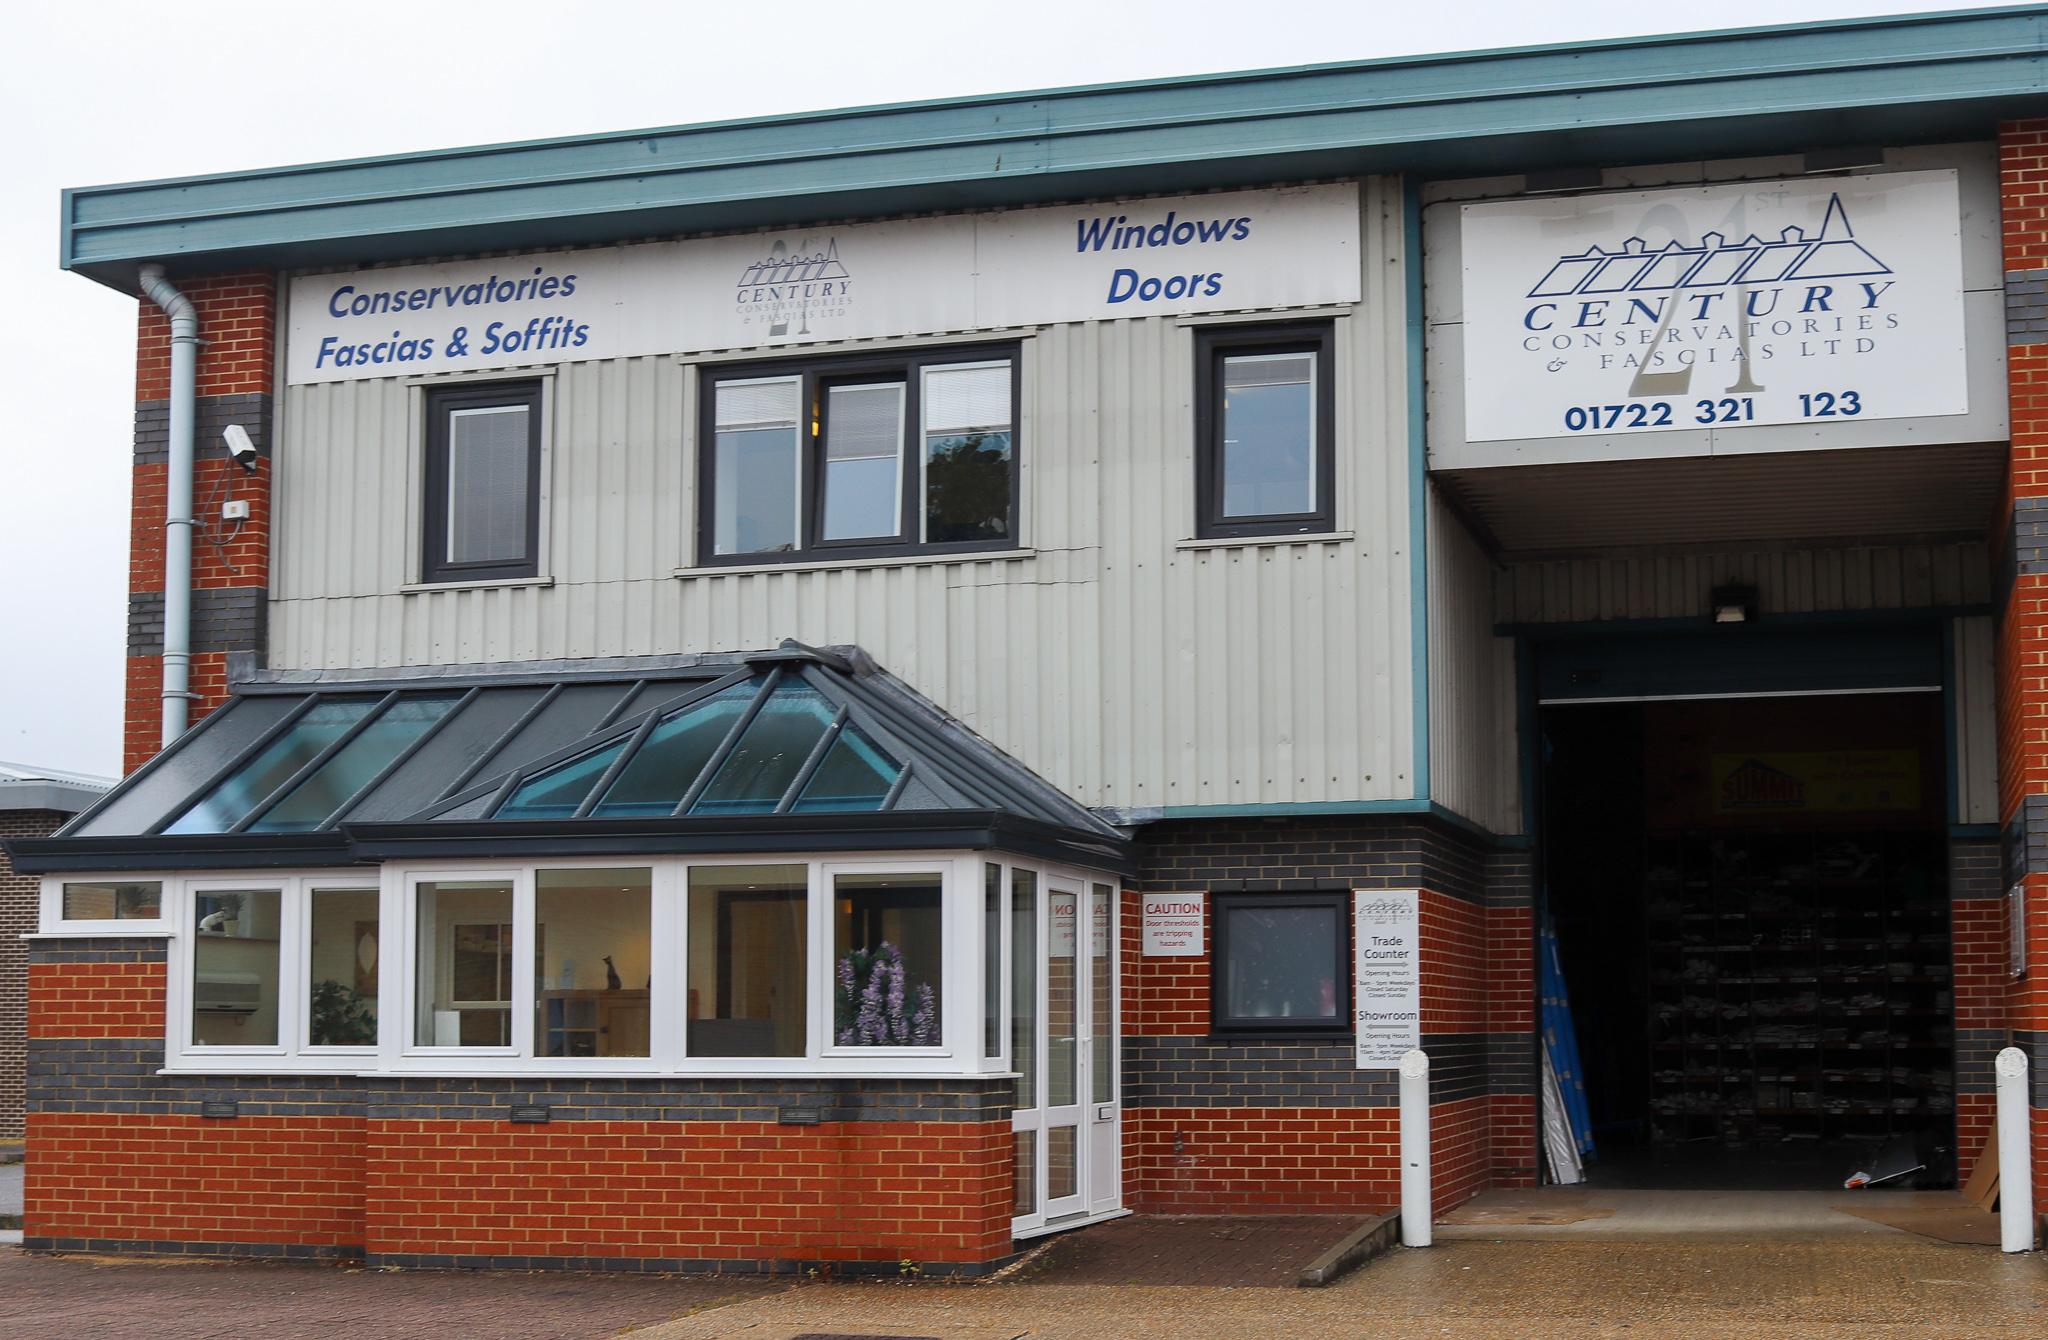 Front view of 21st Century's store in Salisbury, Wiltshire.